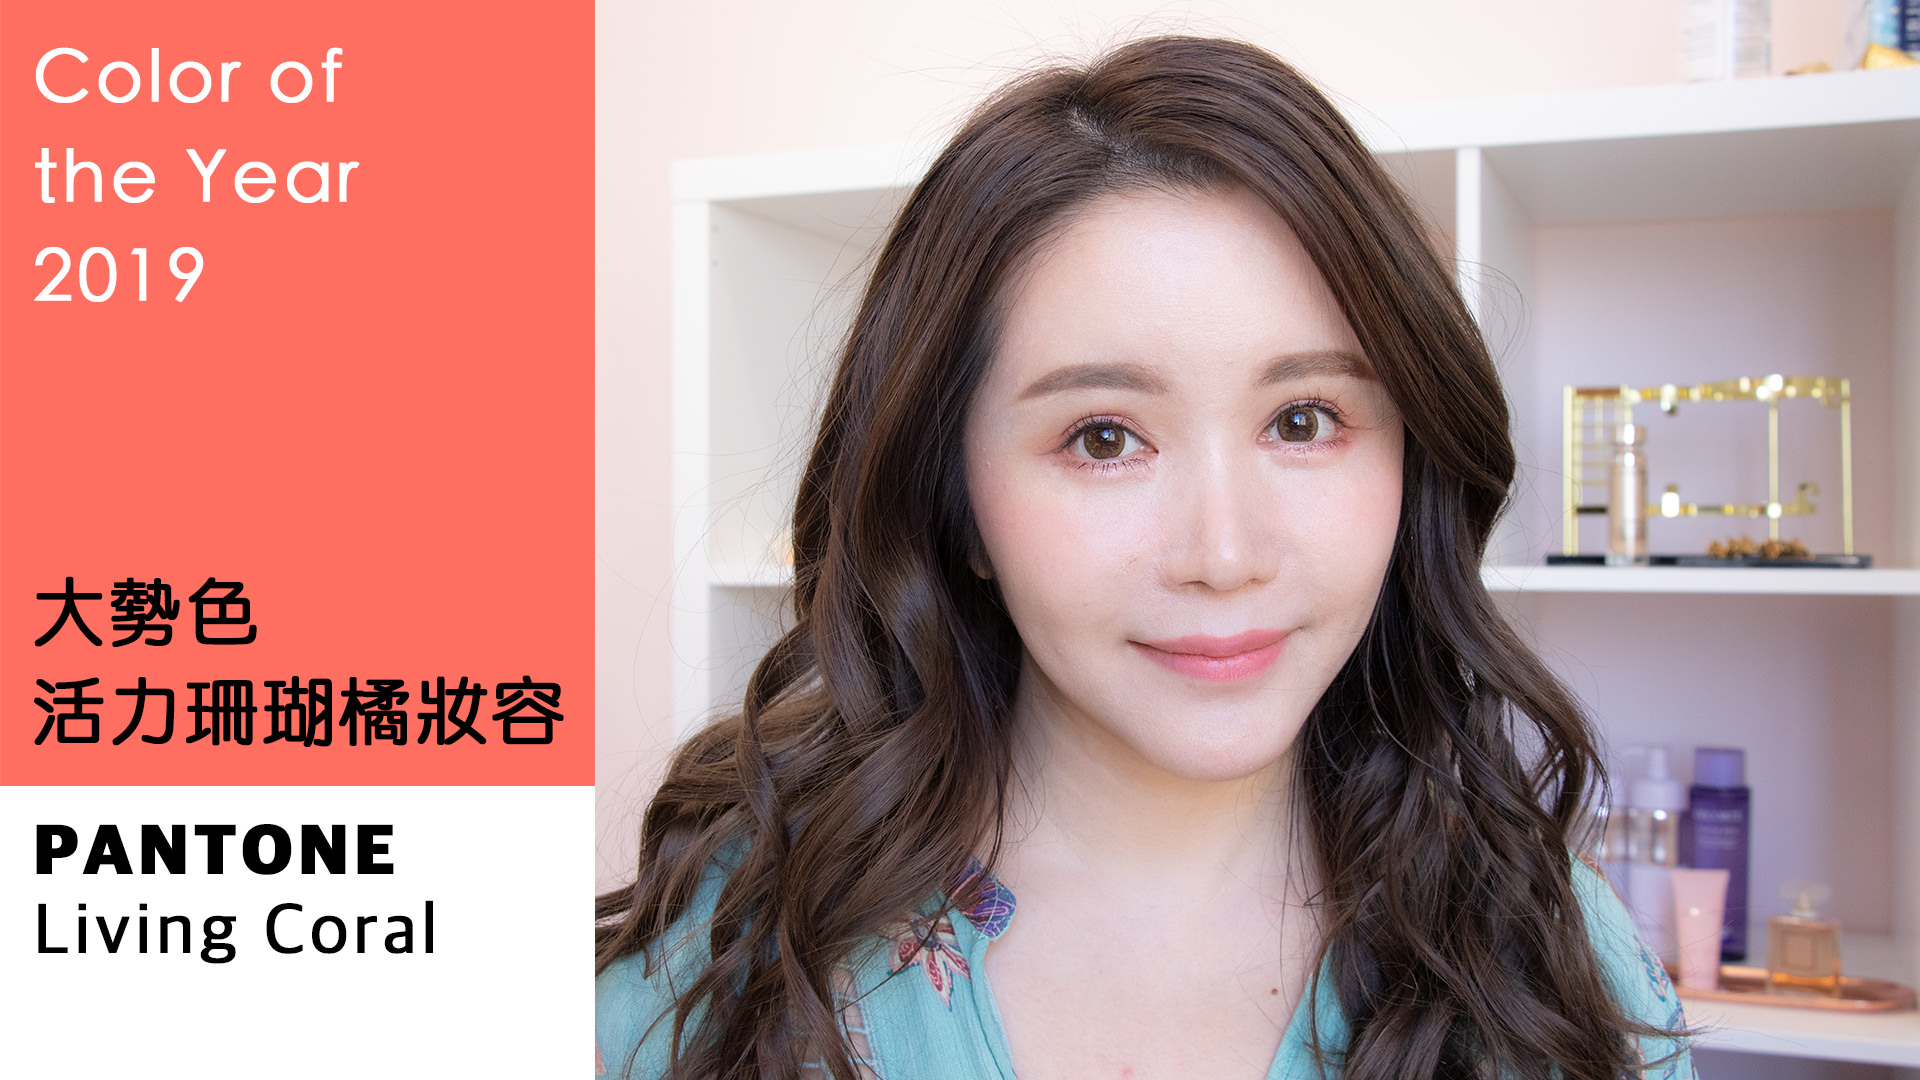 [YOUTUBE] 2019 Pantone大勢色【活力珊瑚橘】妝容 展現一整年的活力!